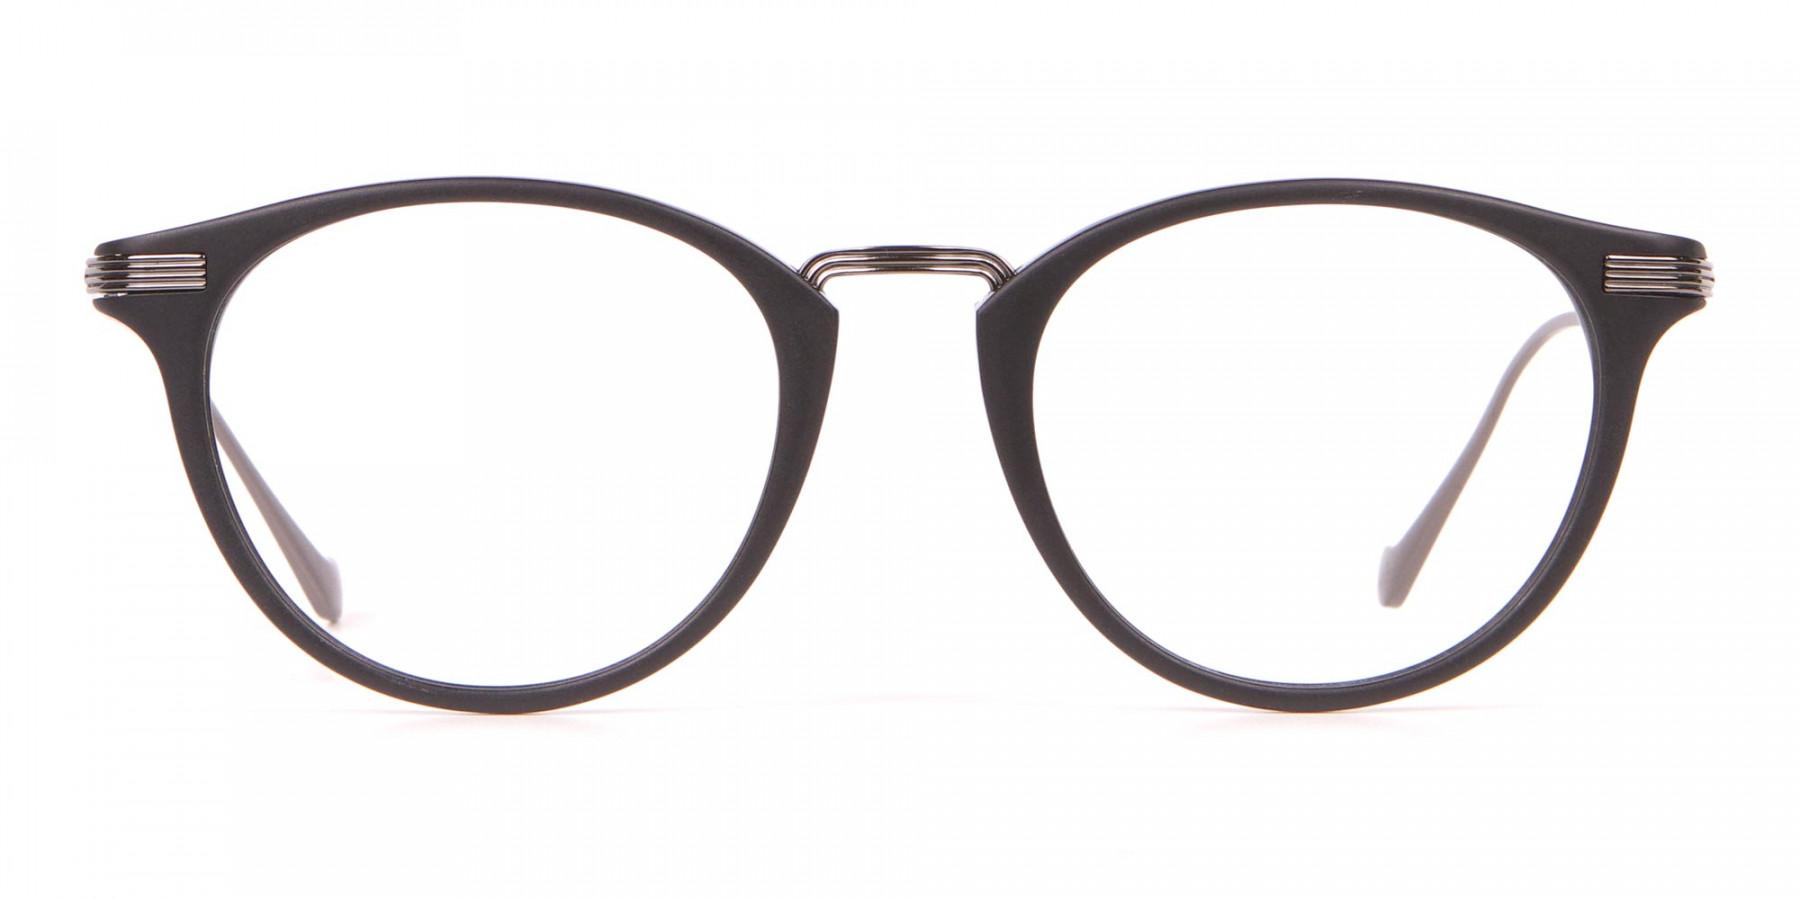 HACKETT HEB173 Bespoke Retro Round Glasses in Matte Black-1